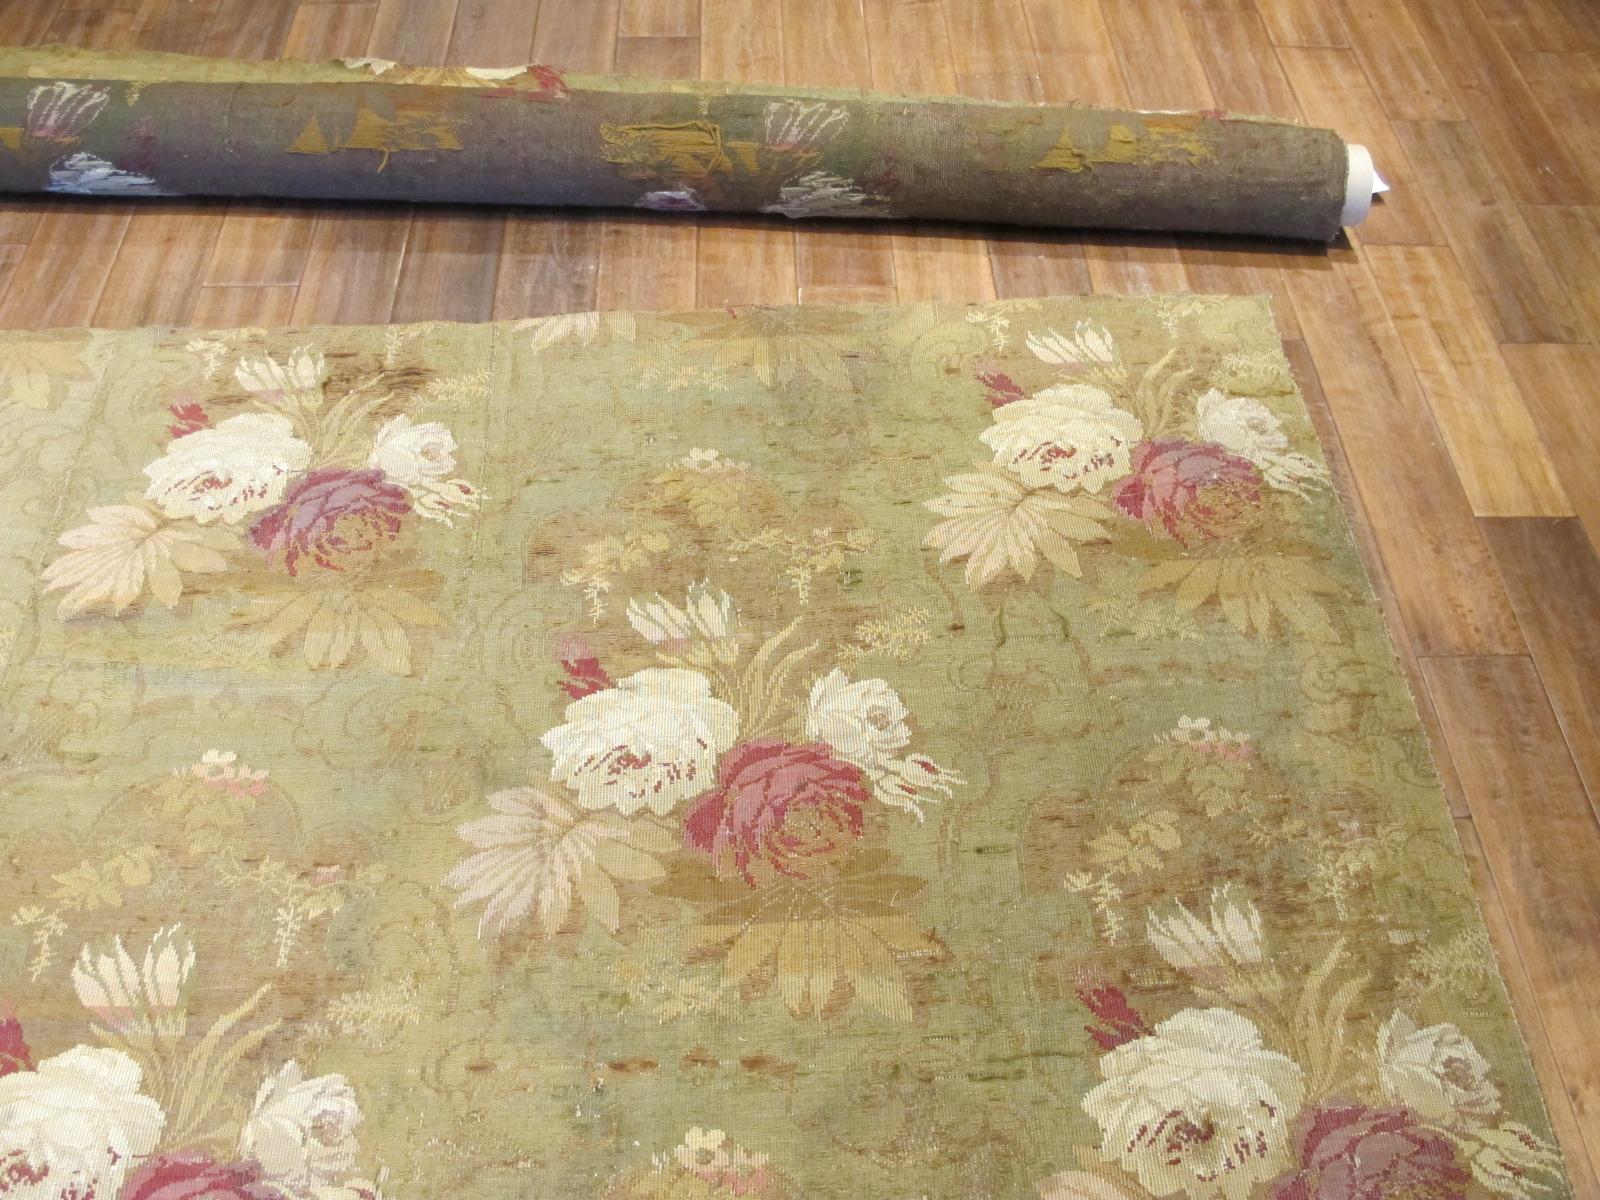 13038.2 European Jacquard Loom rug 9,6x9,8 (2)